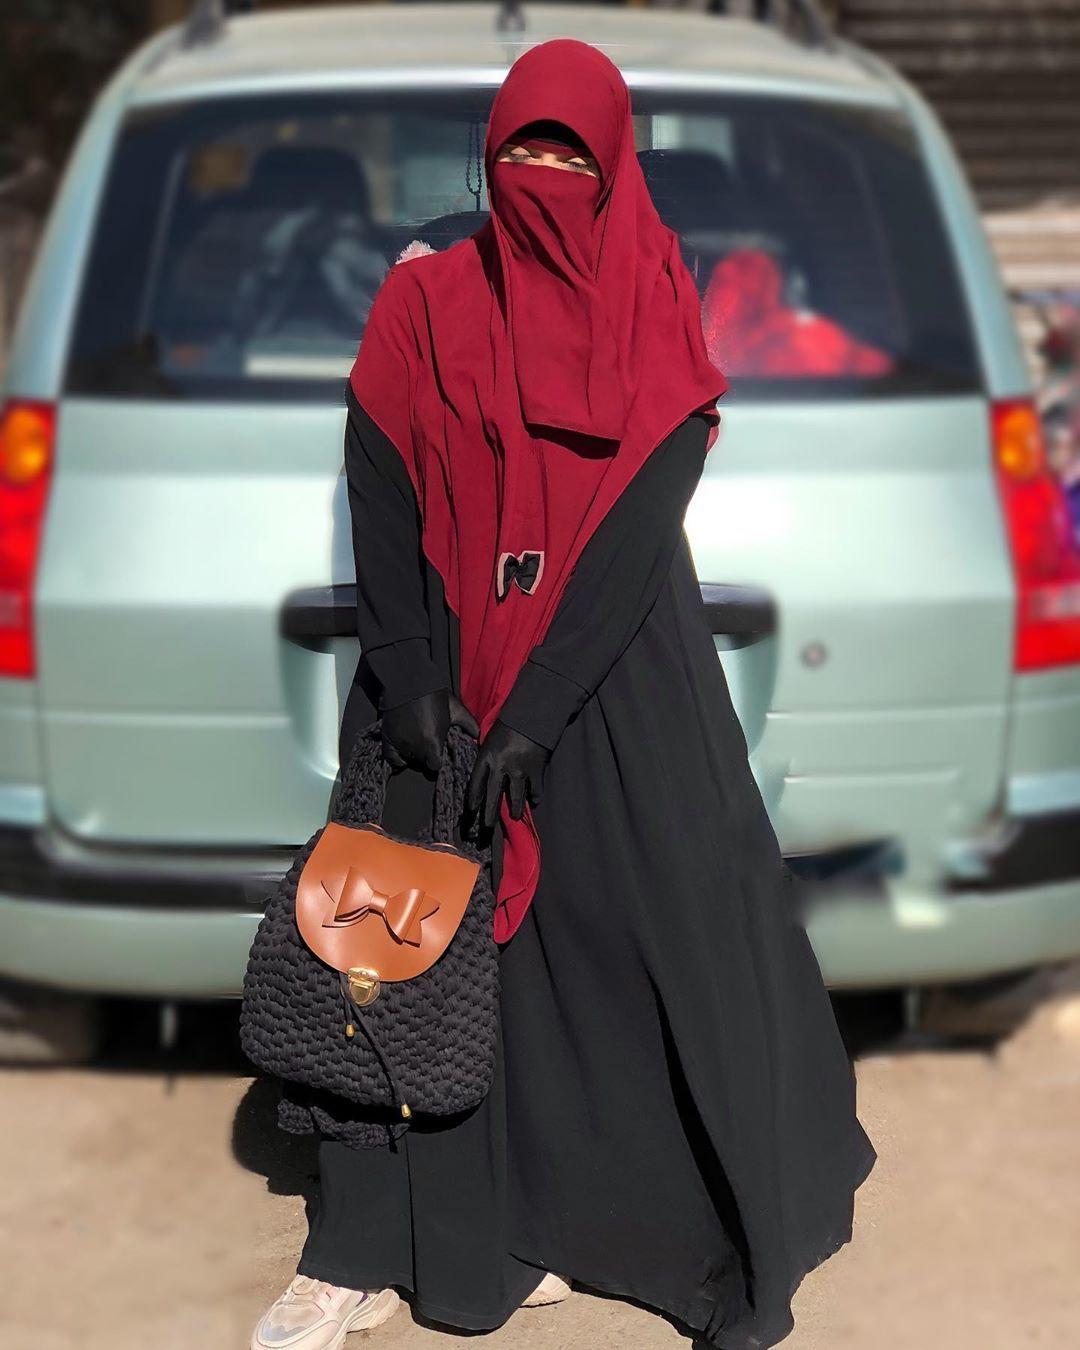 794 Curtidas 21 Comentarios Amany Ghareeb أماني غريب Amany Ghareeb No Instagram لما اقول ل Muslimah Fashion Outfits Arab Girls Hijab Stylish Hijab